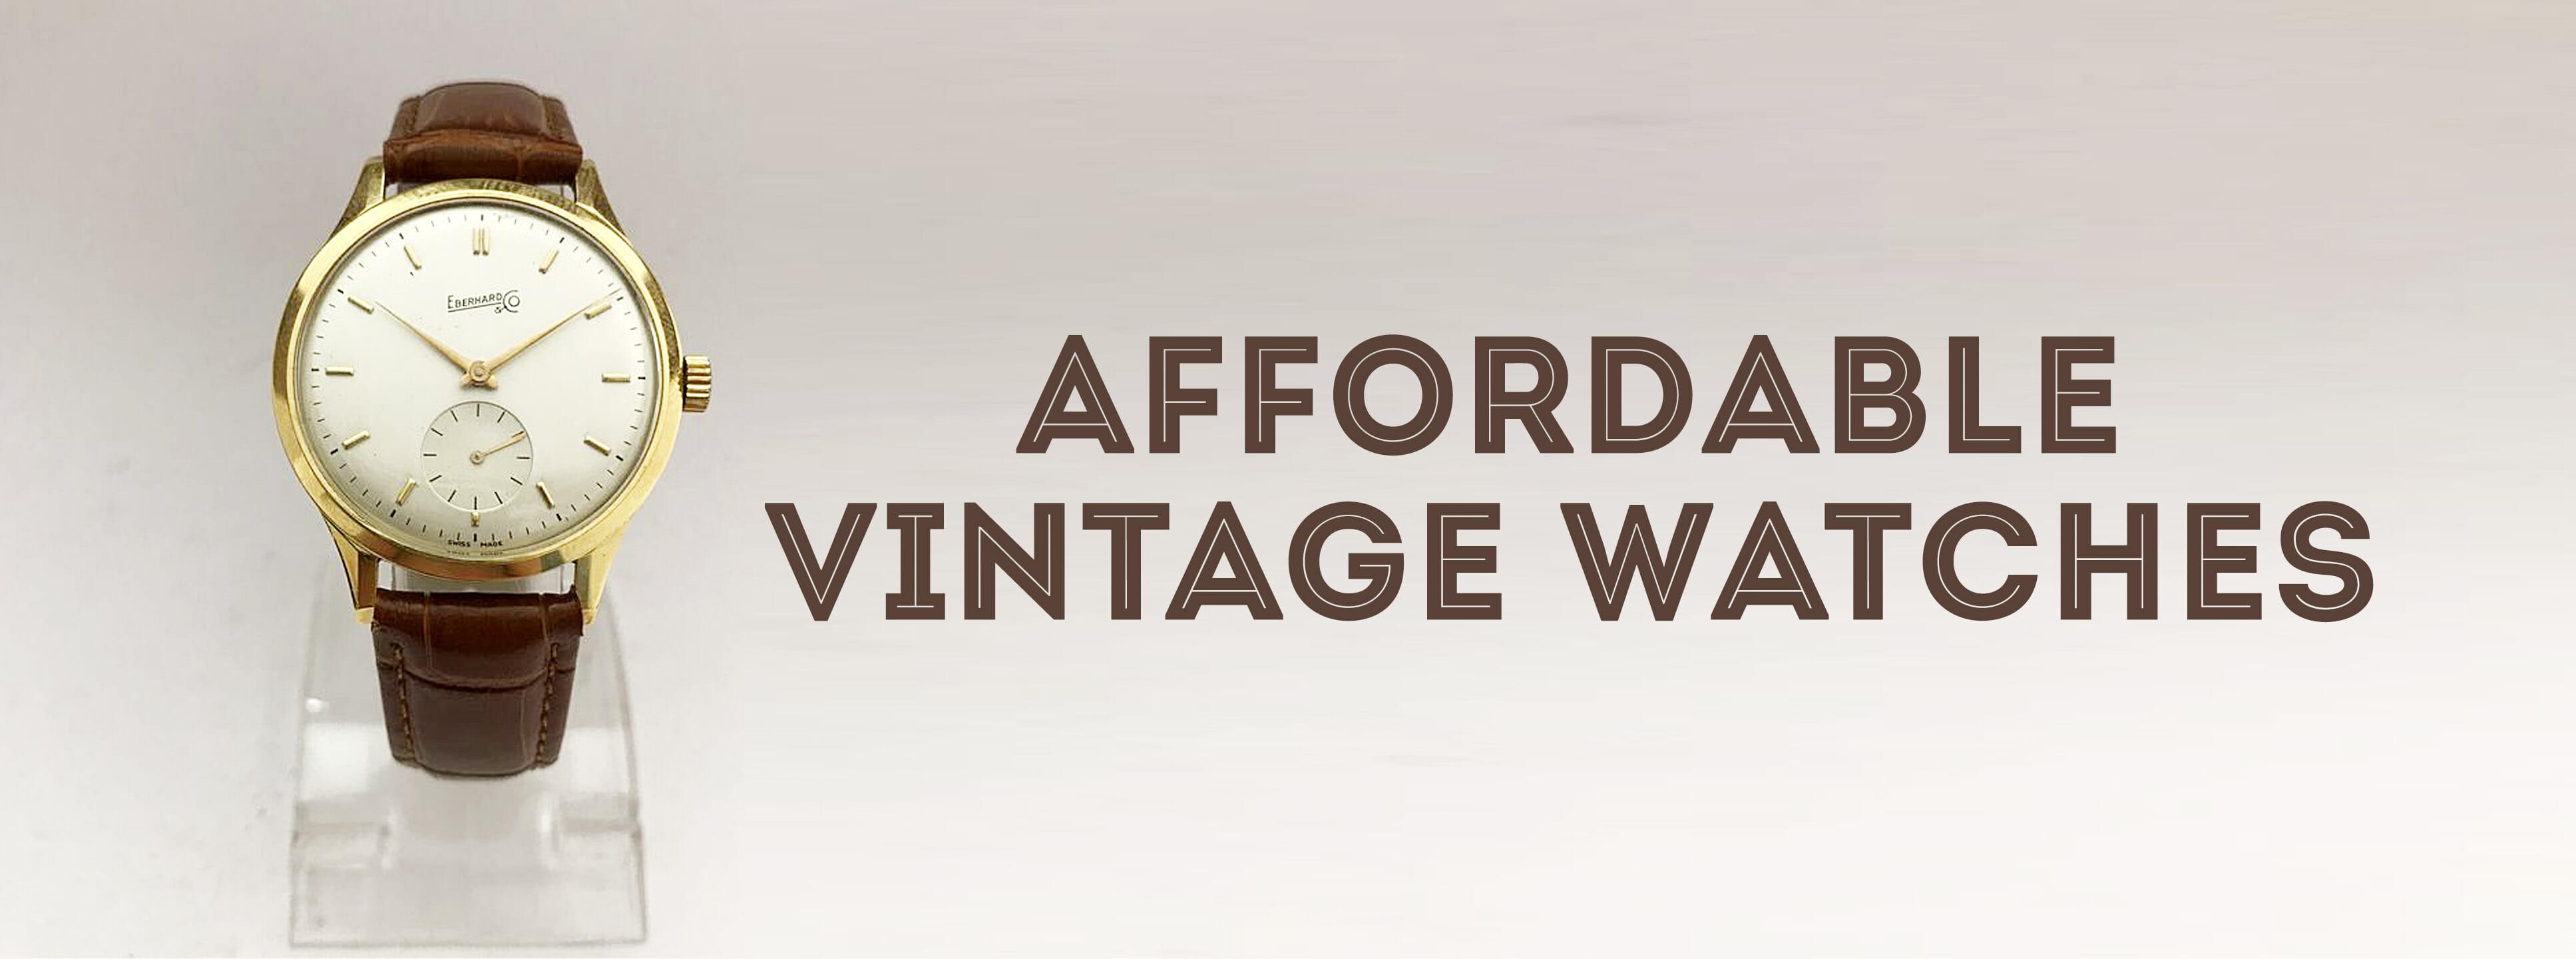 d0d30f7f3 Affordable Vintage Watches — Gentleman's Gazette